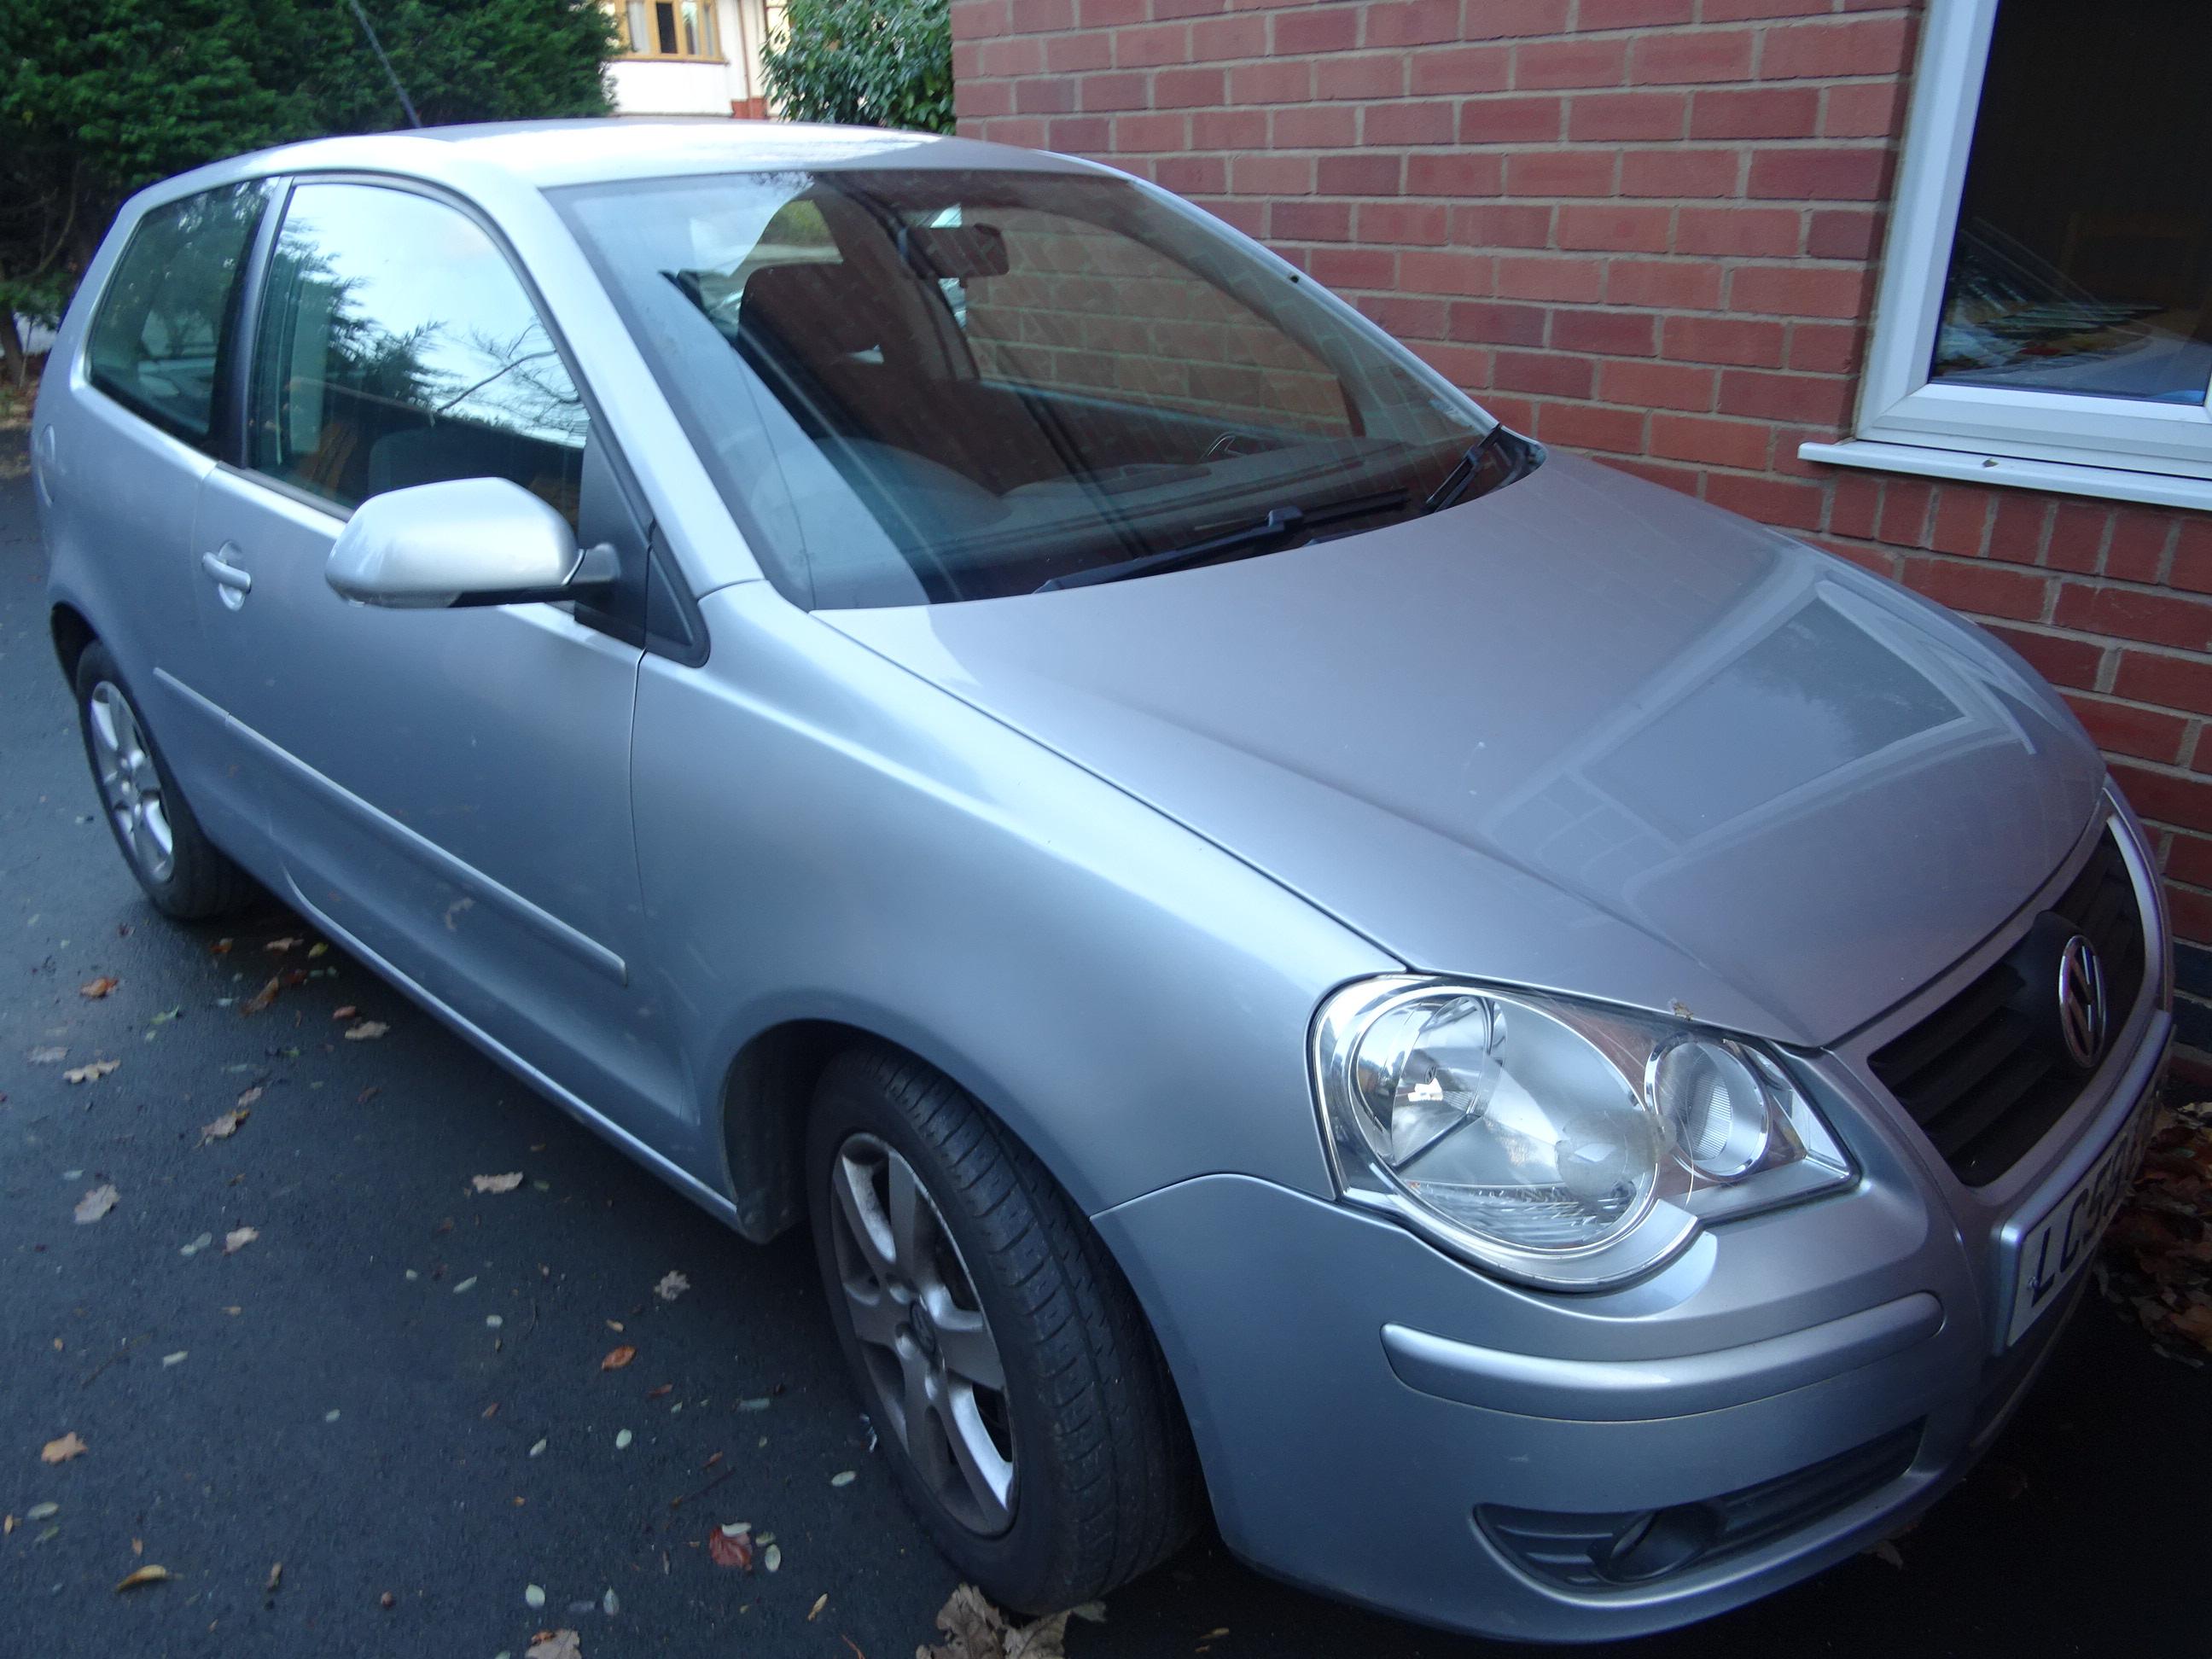 VW Polo 1.4 Match 3 dr 2009 59, 66000 miles